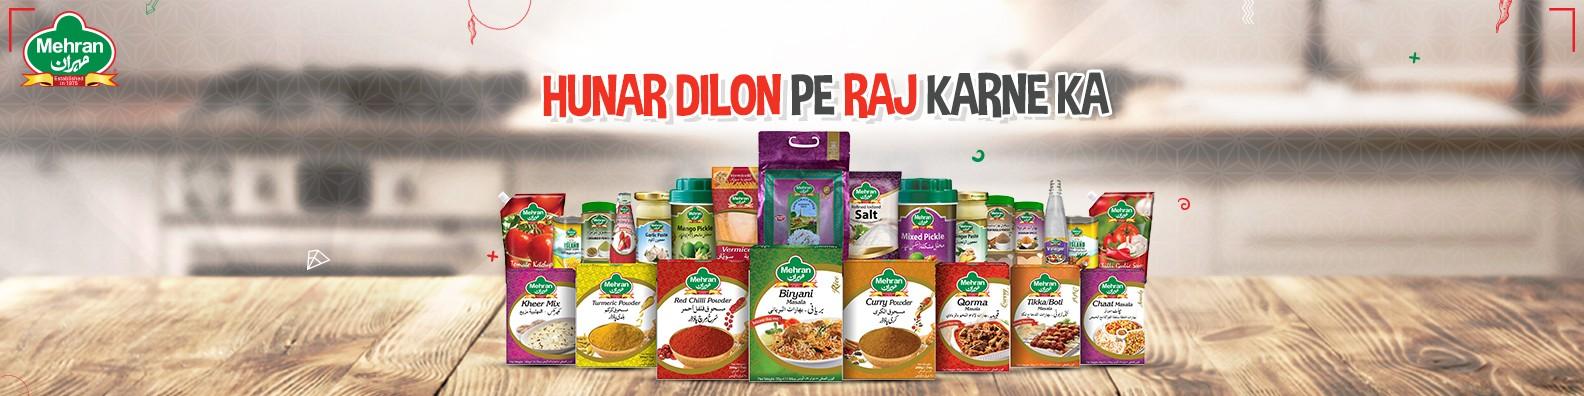 Mehran Spice & Food Industries | LinkedIn